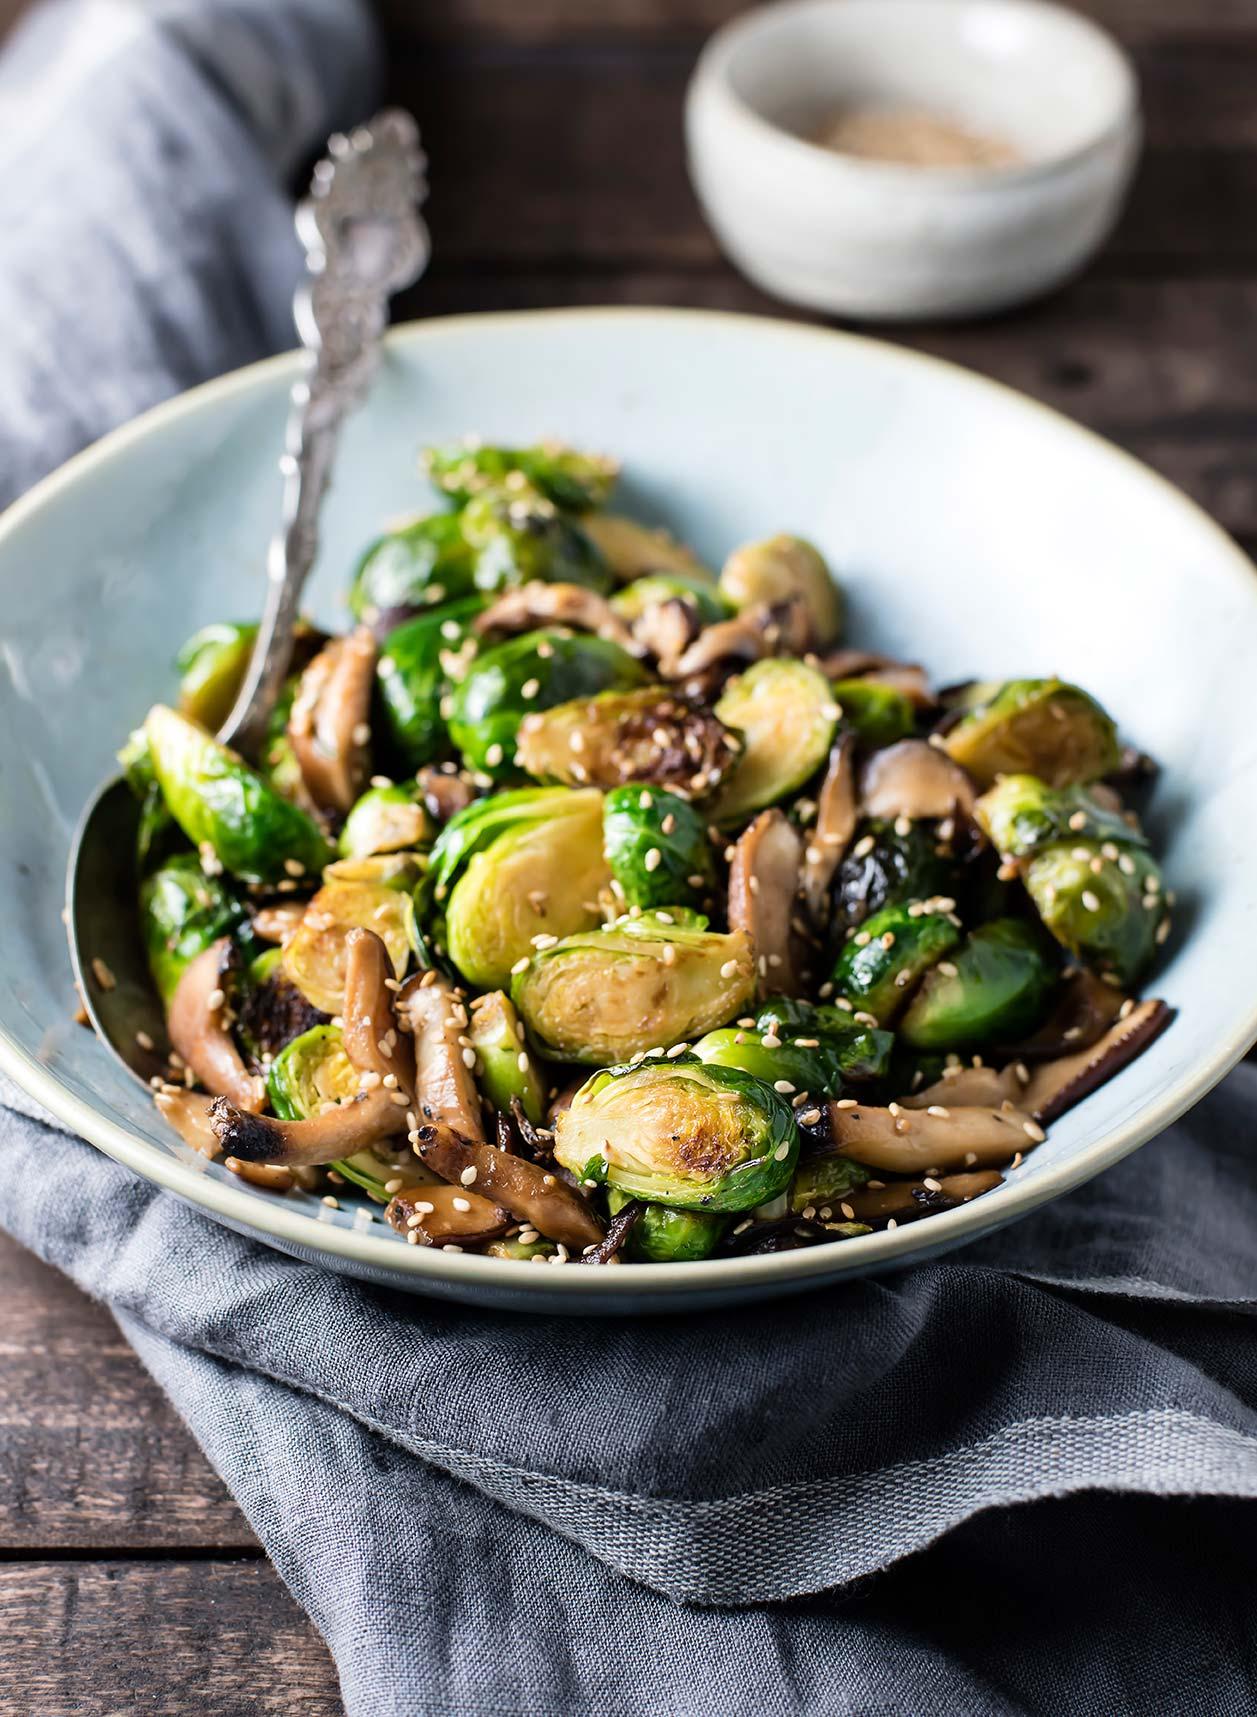 Brussels Sprout & Mushroom Sesame Stir Fry